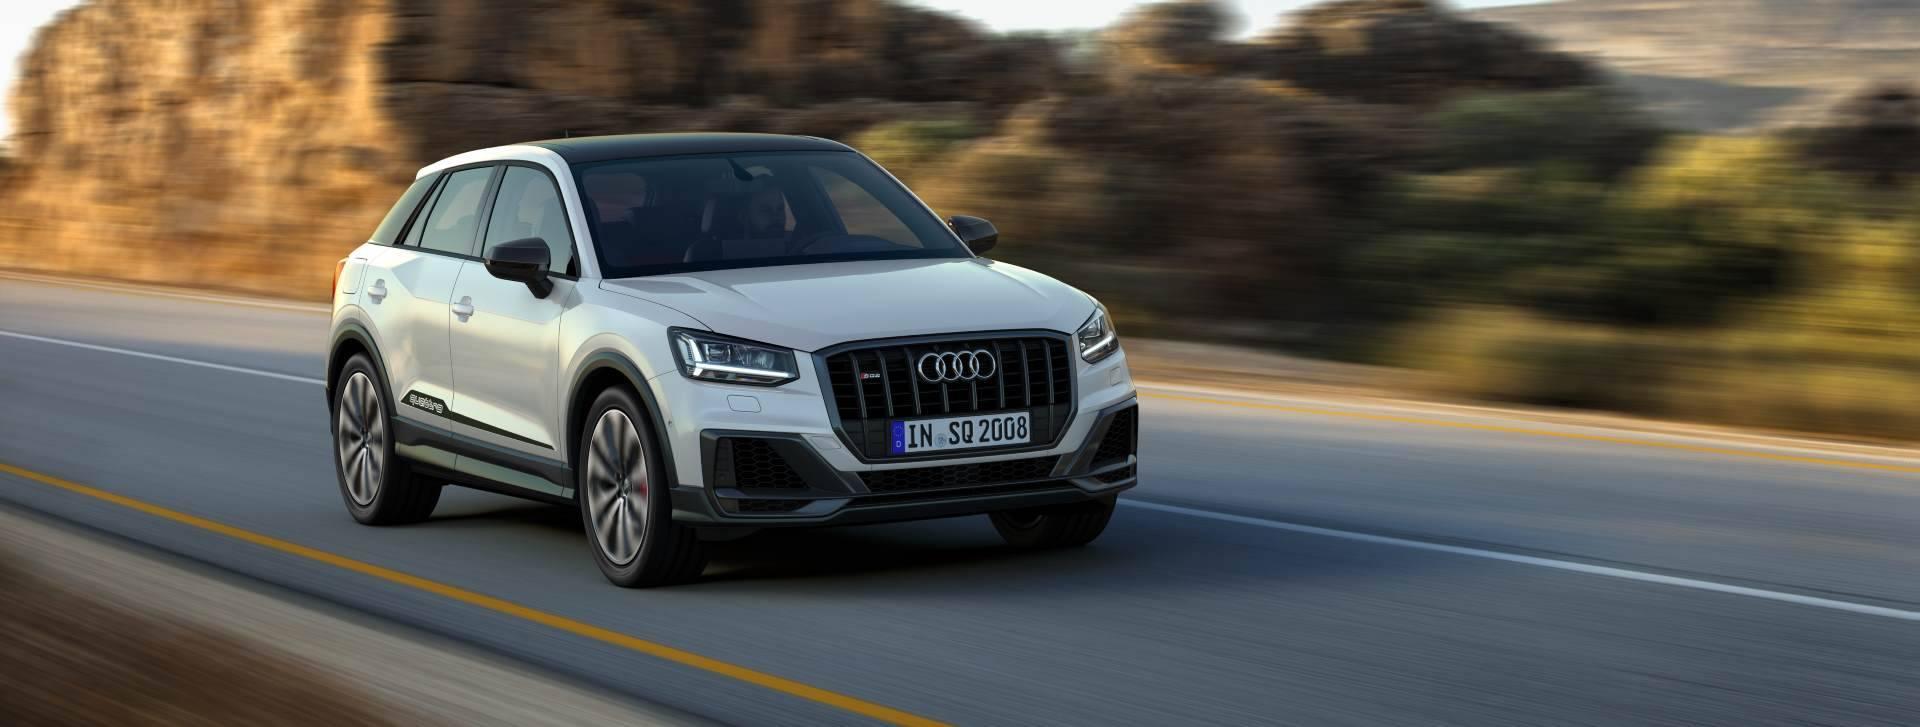 Nouvelle Audi SQ2 2019 diapo1